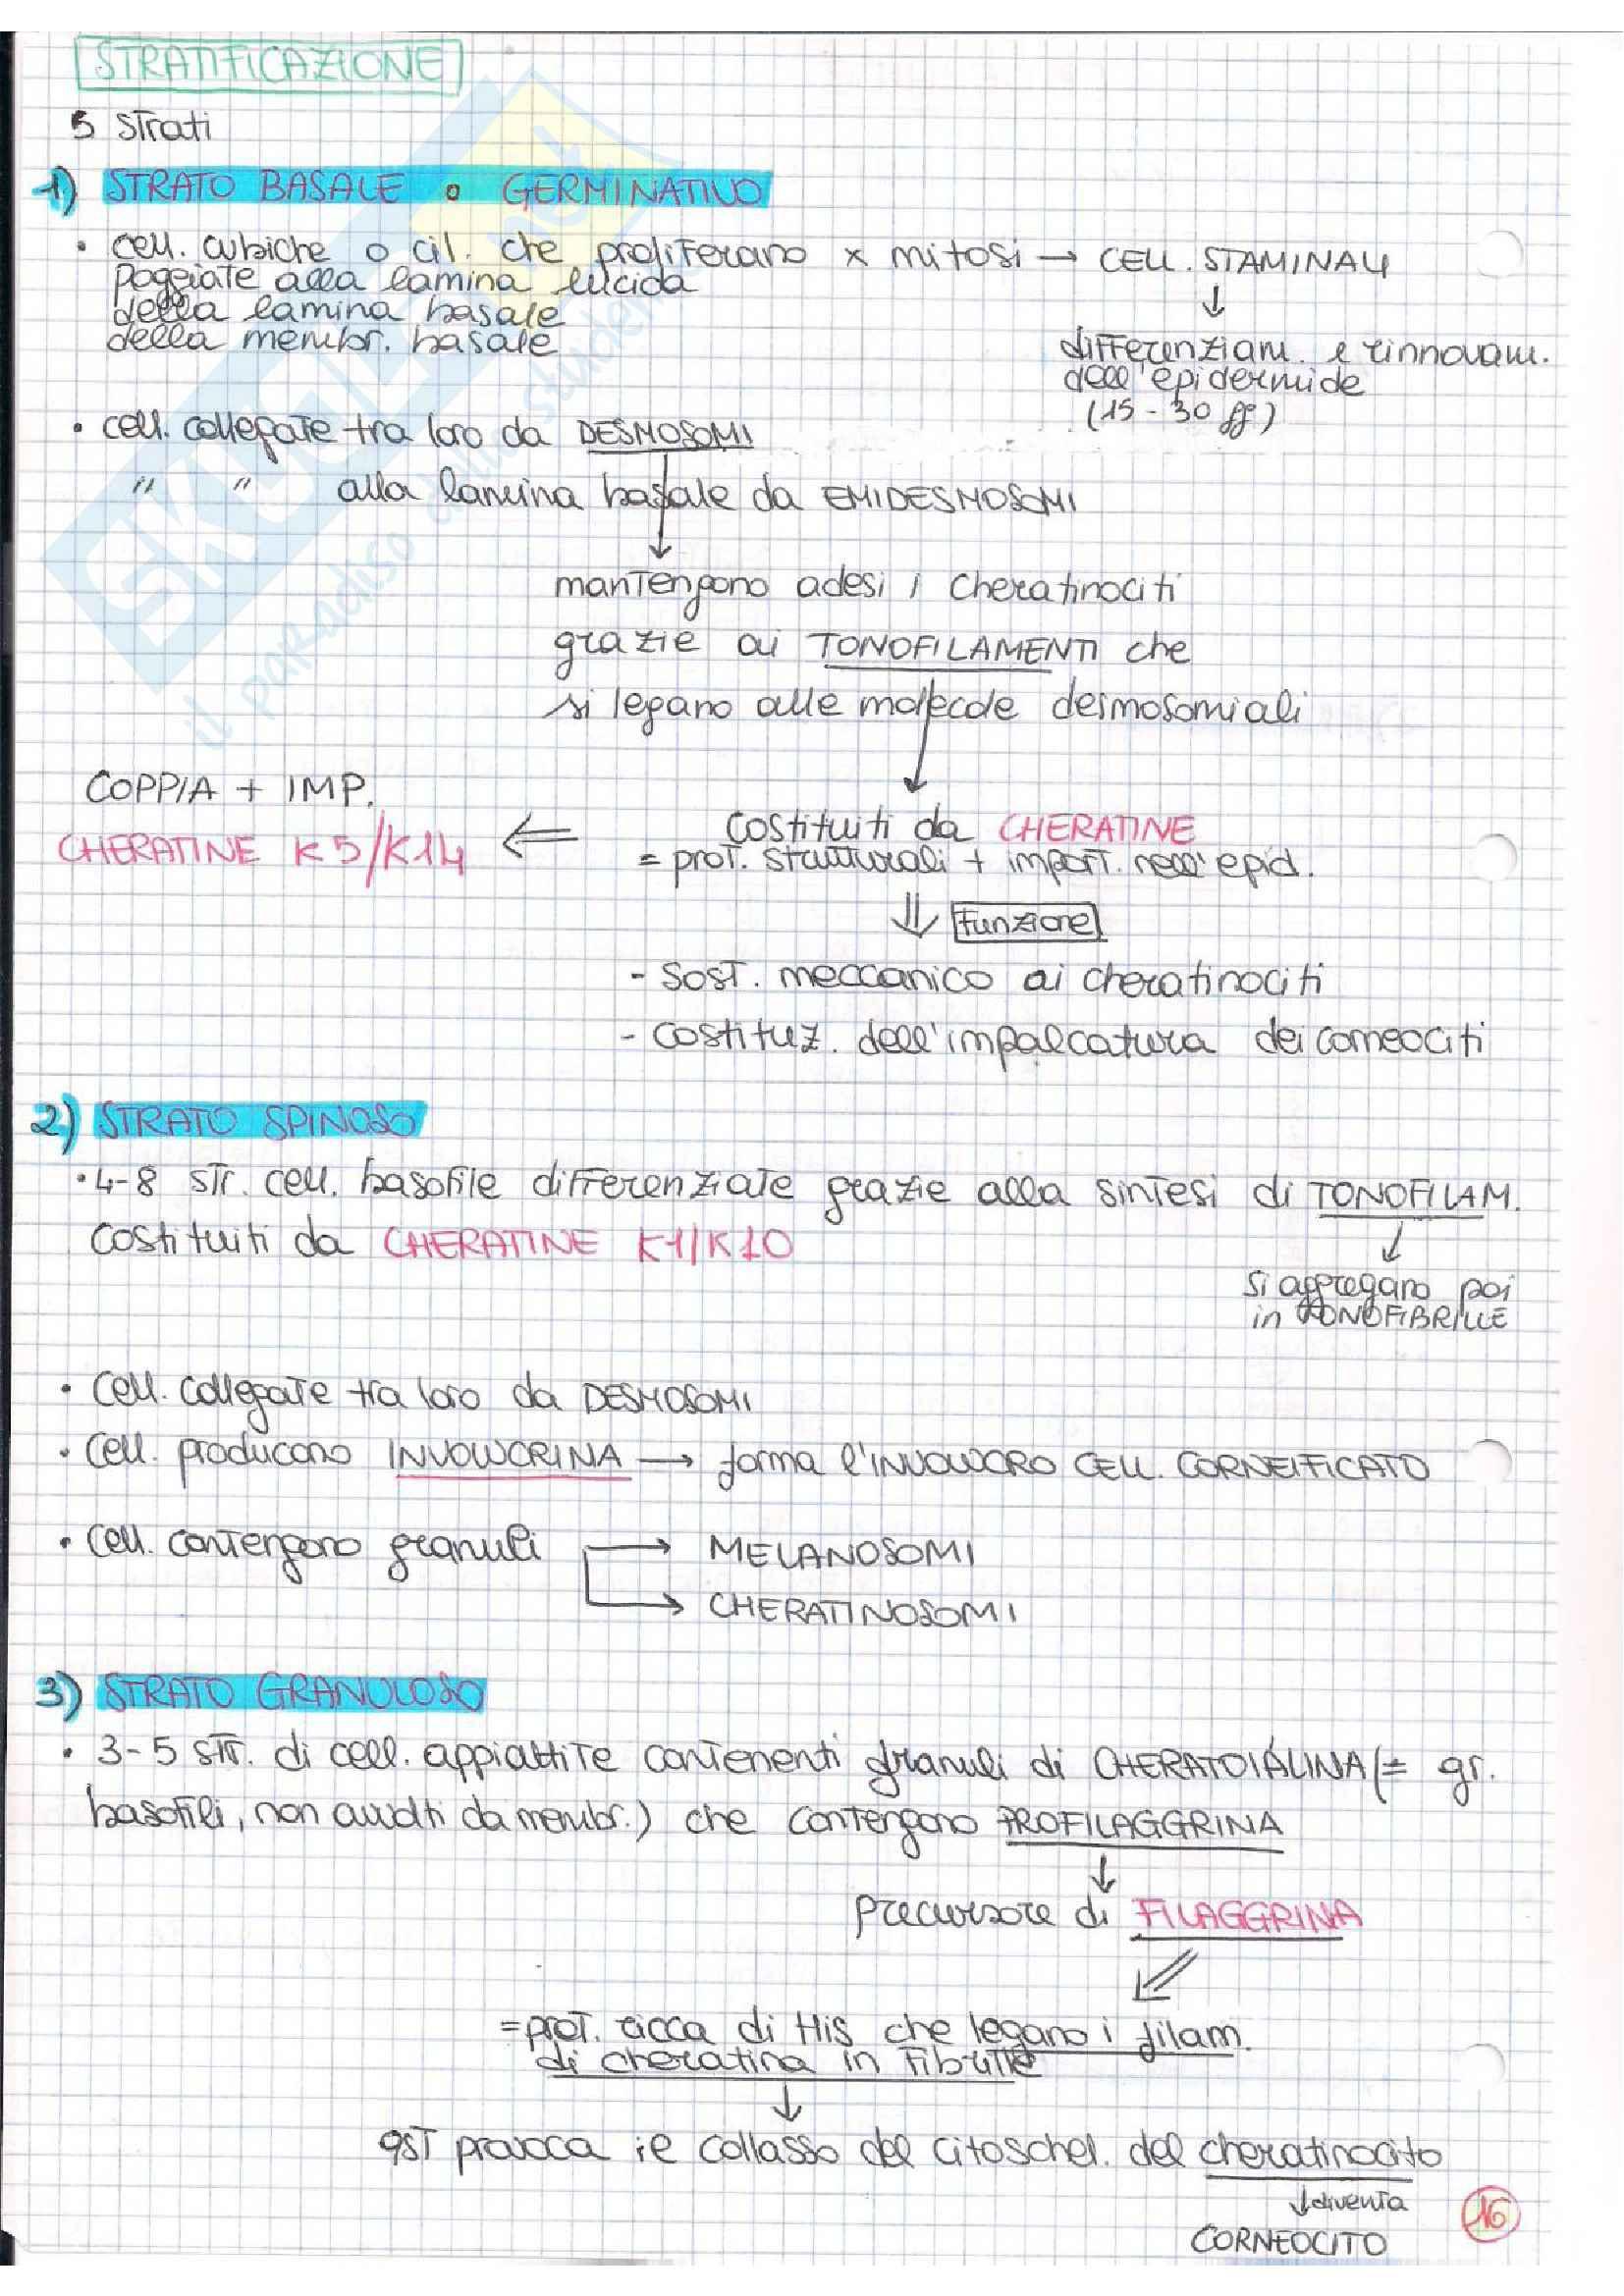 Istologia (esame istologia ed embriologia) Pag. 16